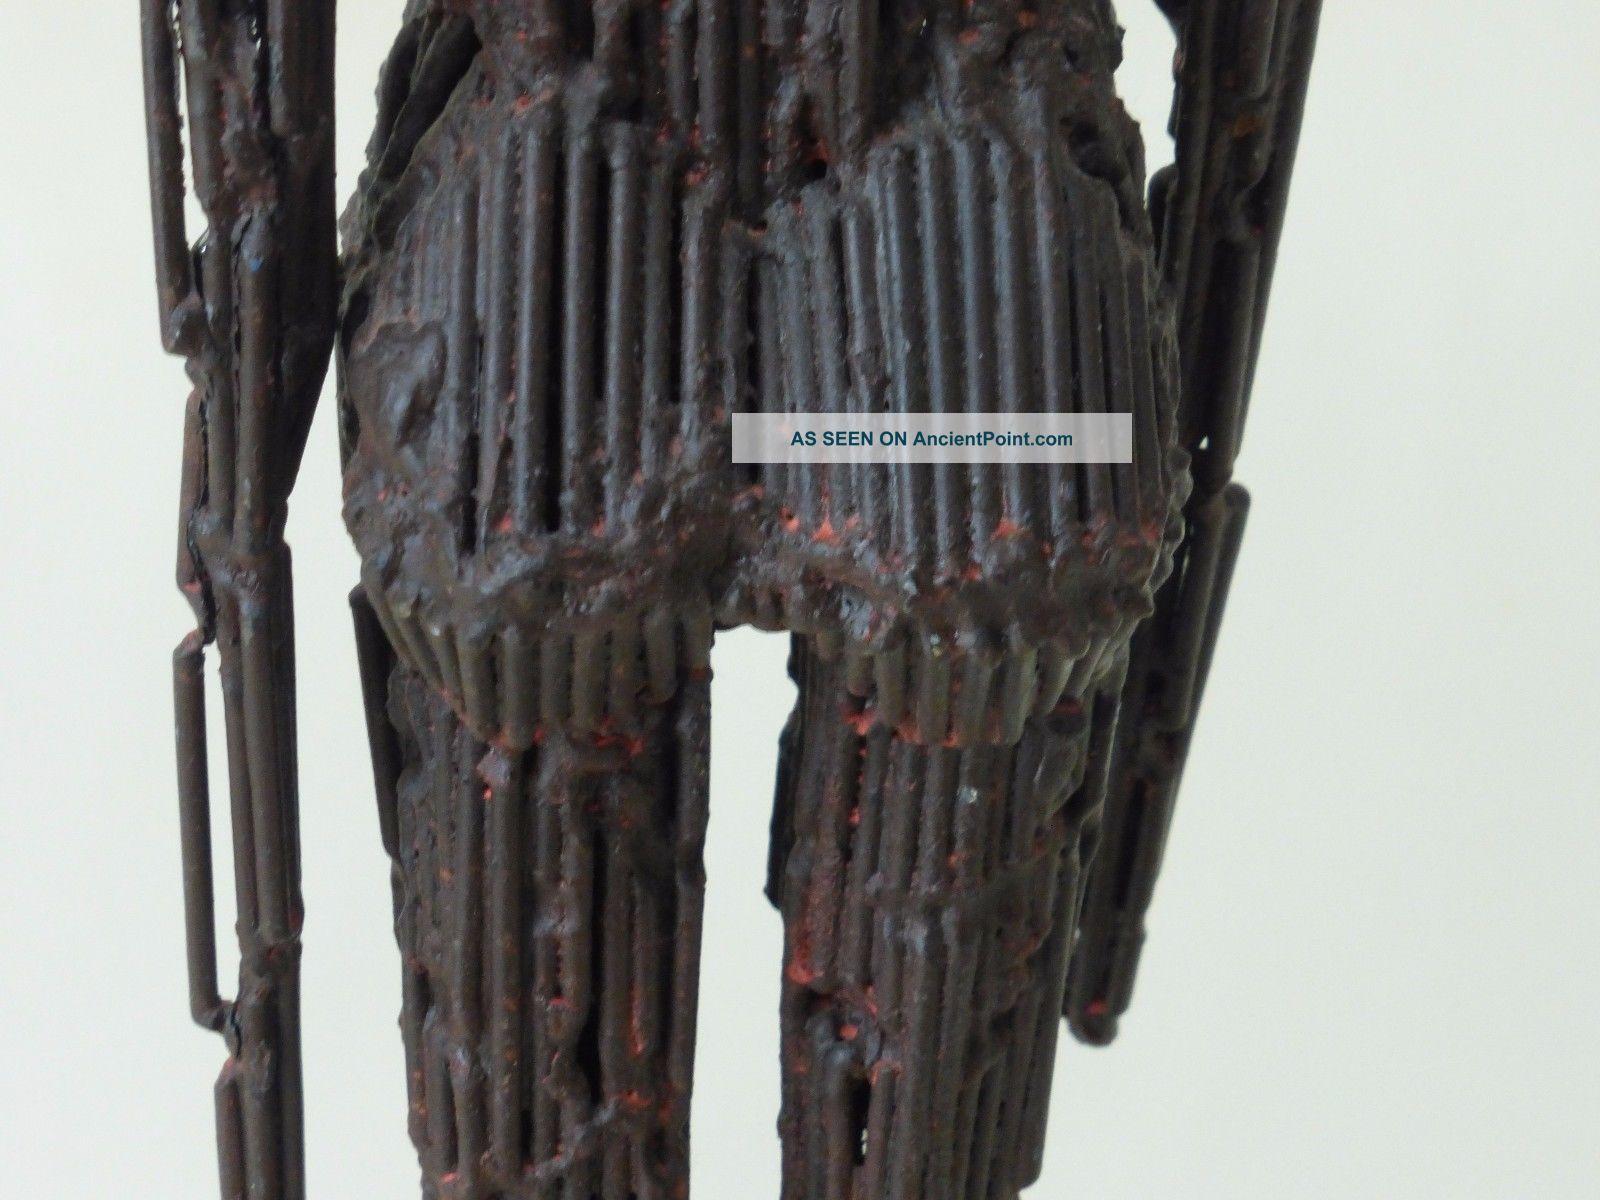 Giacometti Style Mid Century Elongated Brutalist Metal Female Statue 25 5/8